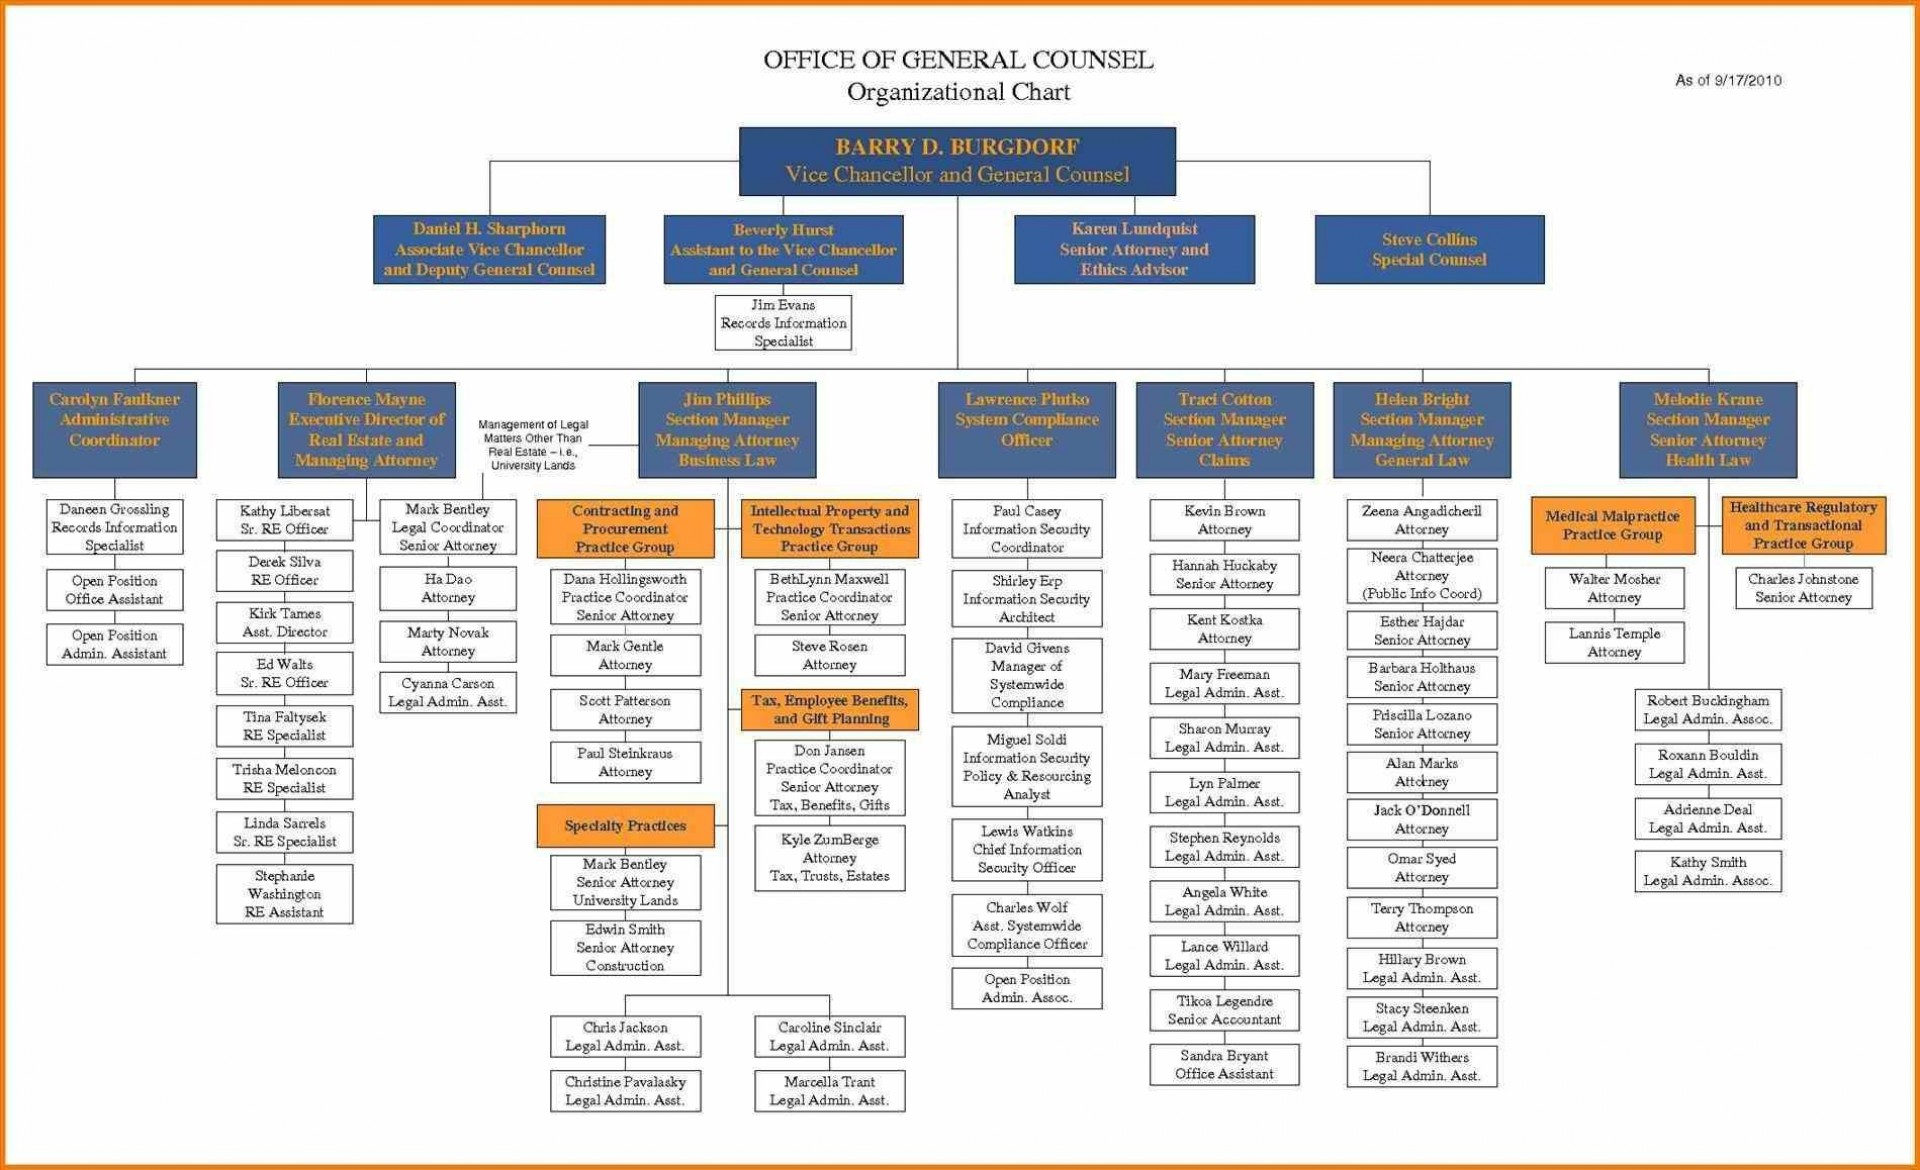 005 Best Organization Chart Template Excel 2010 Photo  Org Organizational1920